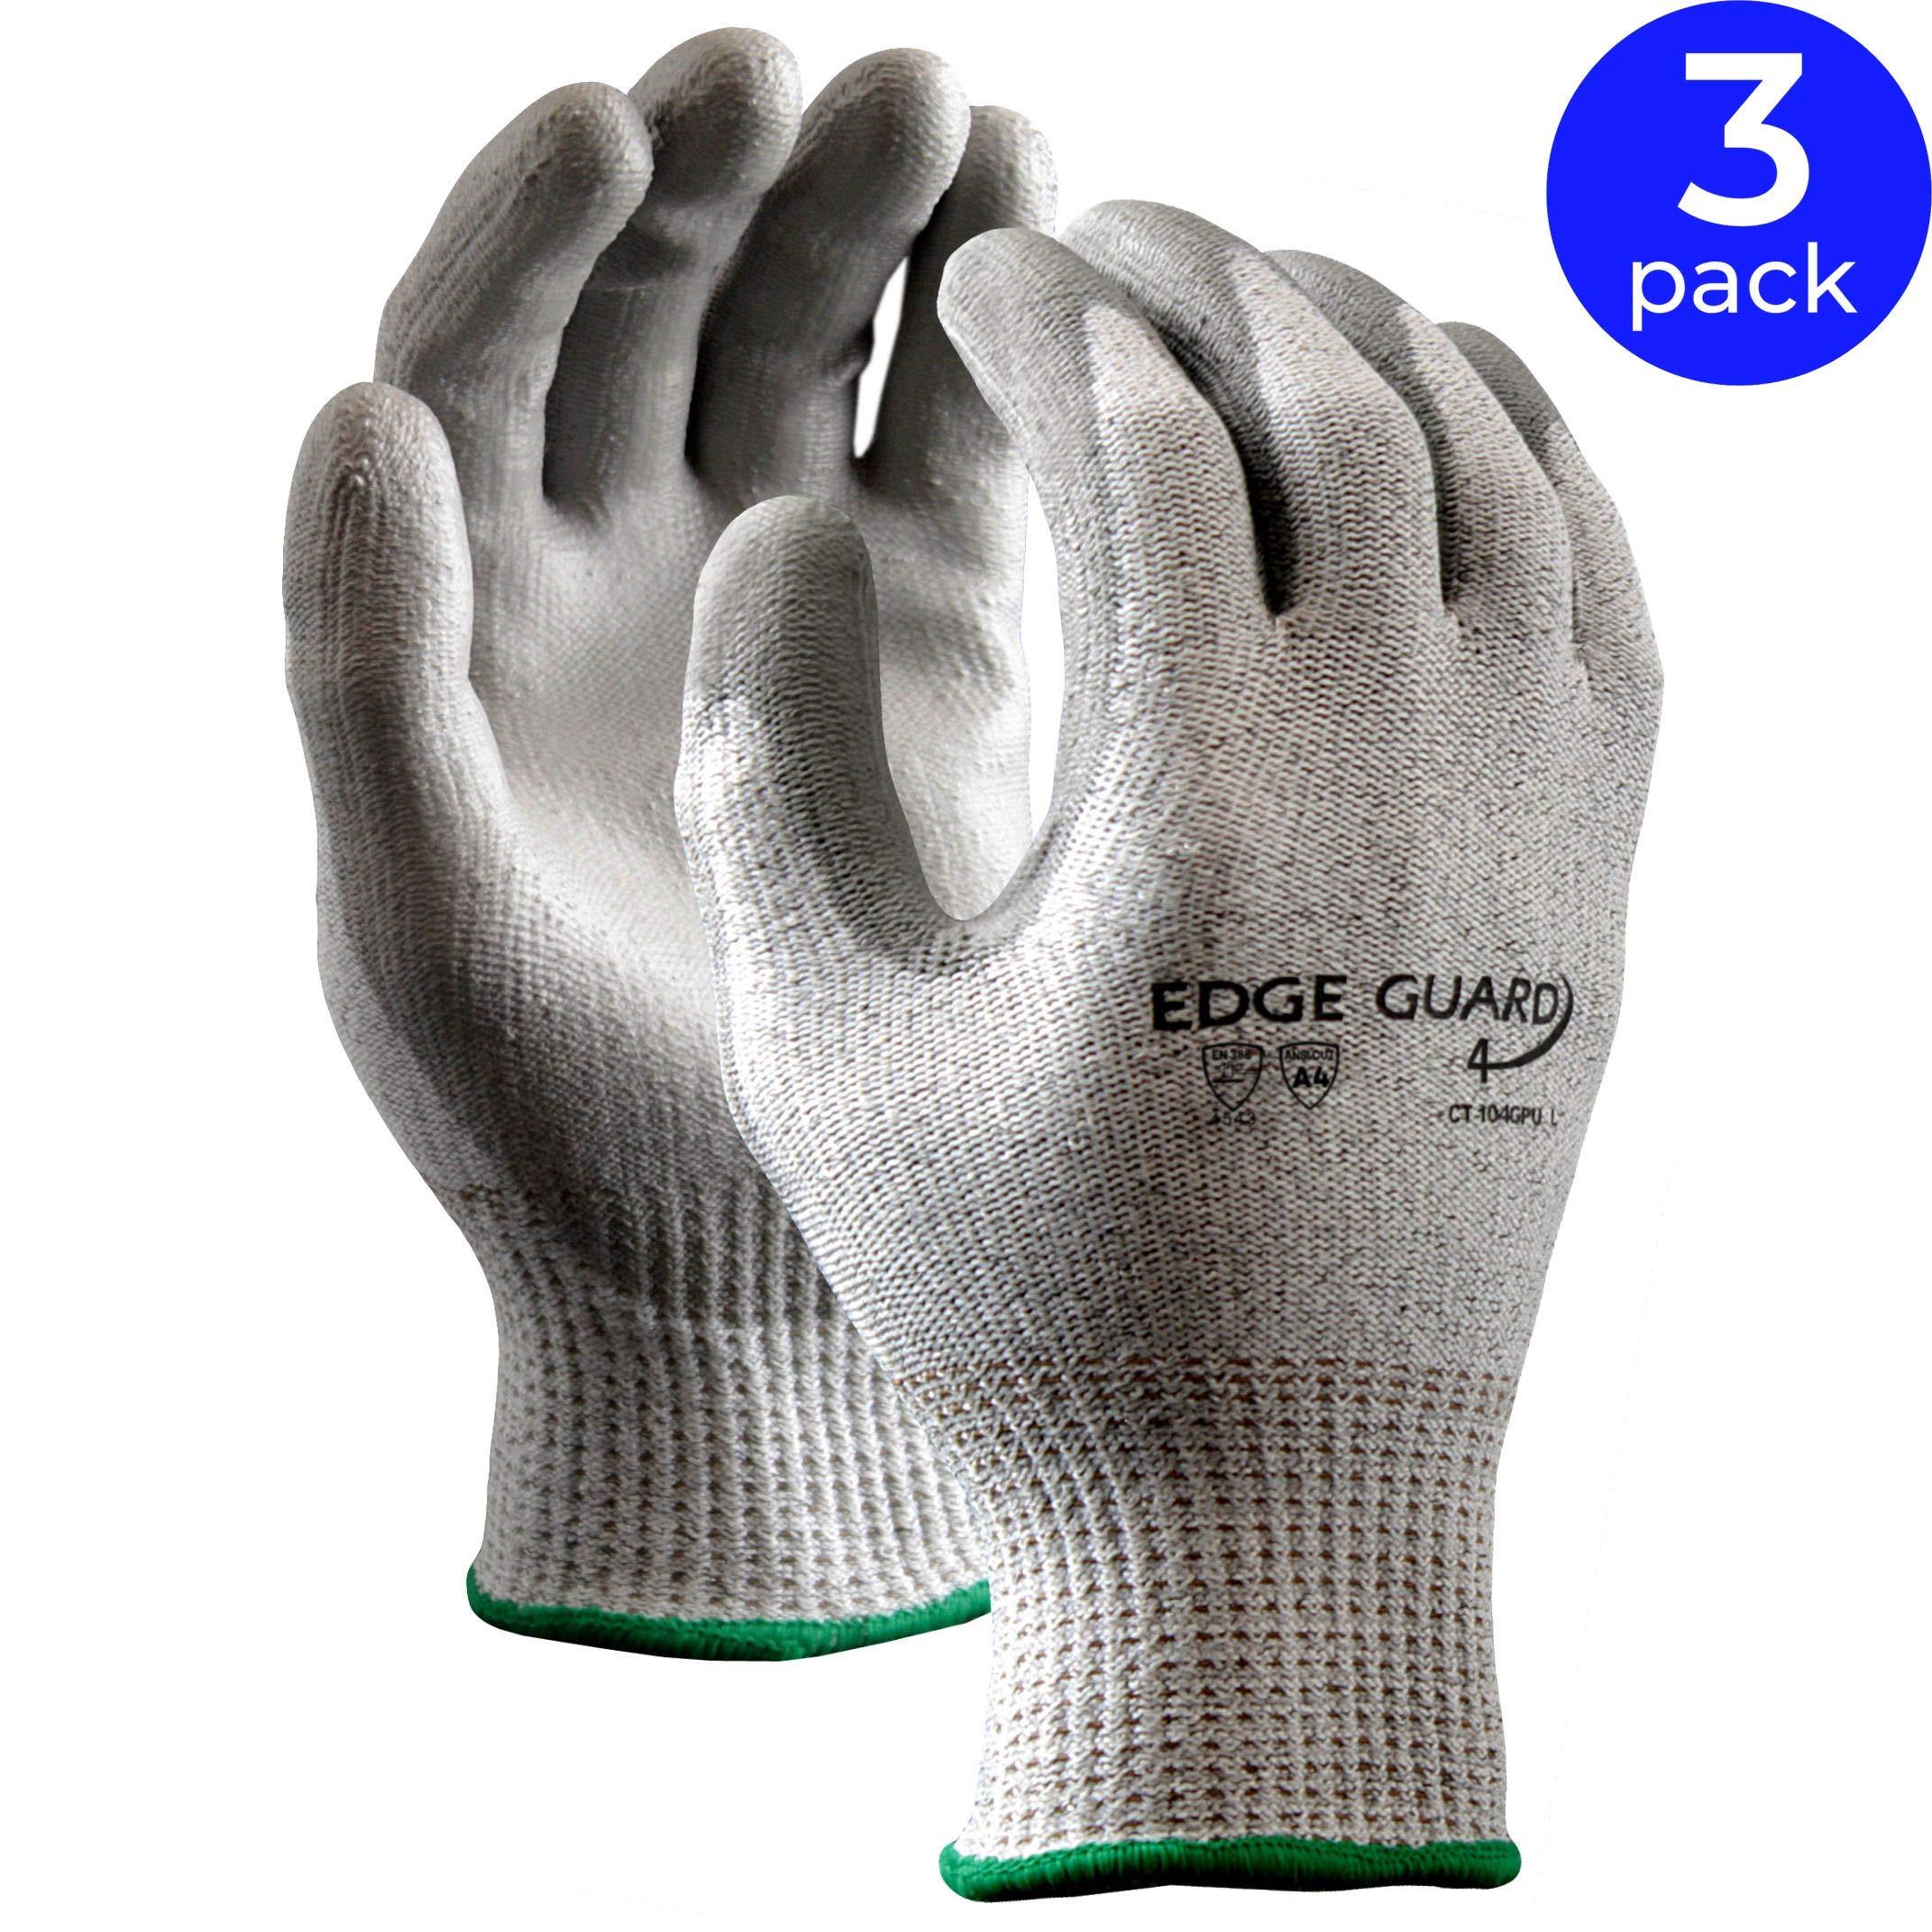 Stauffer EdgeGuard4TM Cut Resistant Glove with PU Coating, Cut Level A4 | Gray/Salt and Pepper Color, Knit Wrist Cuff - 2XL (Pack of 3)